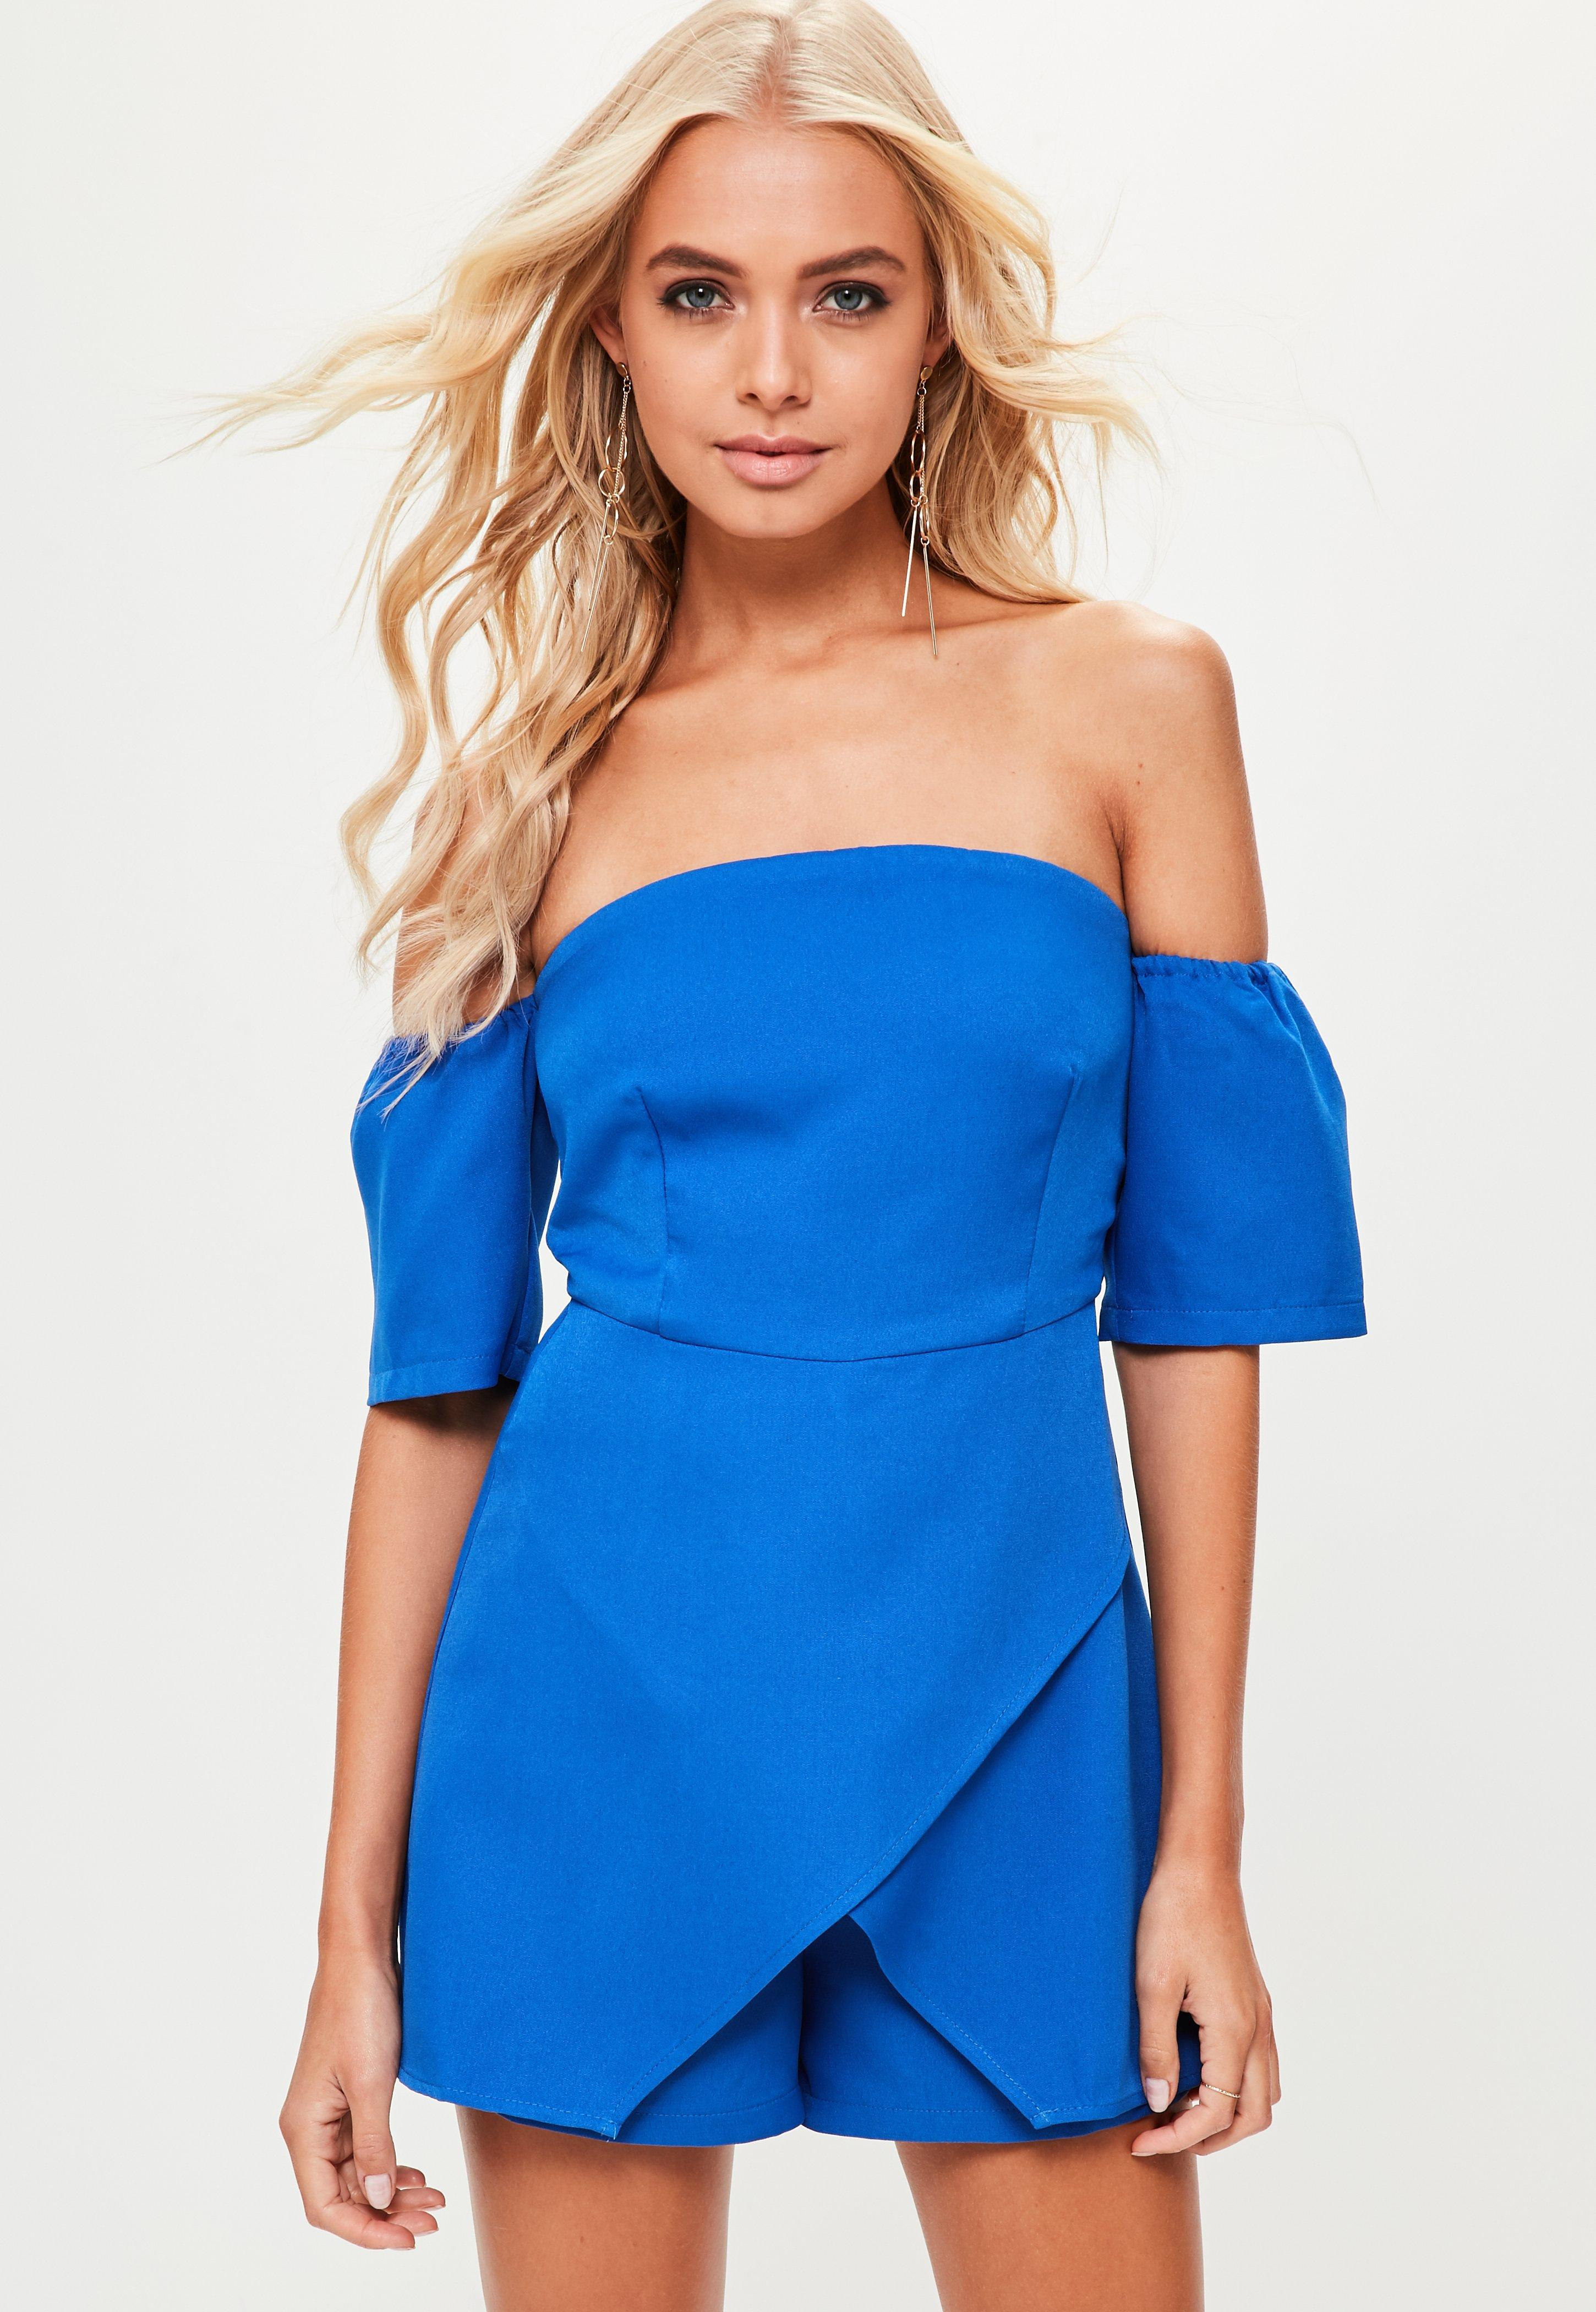 d77912f74a Missguided Blue Bardot Skort Playsuit in Blue - Save ...